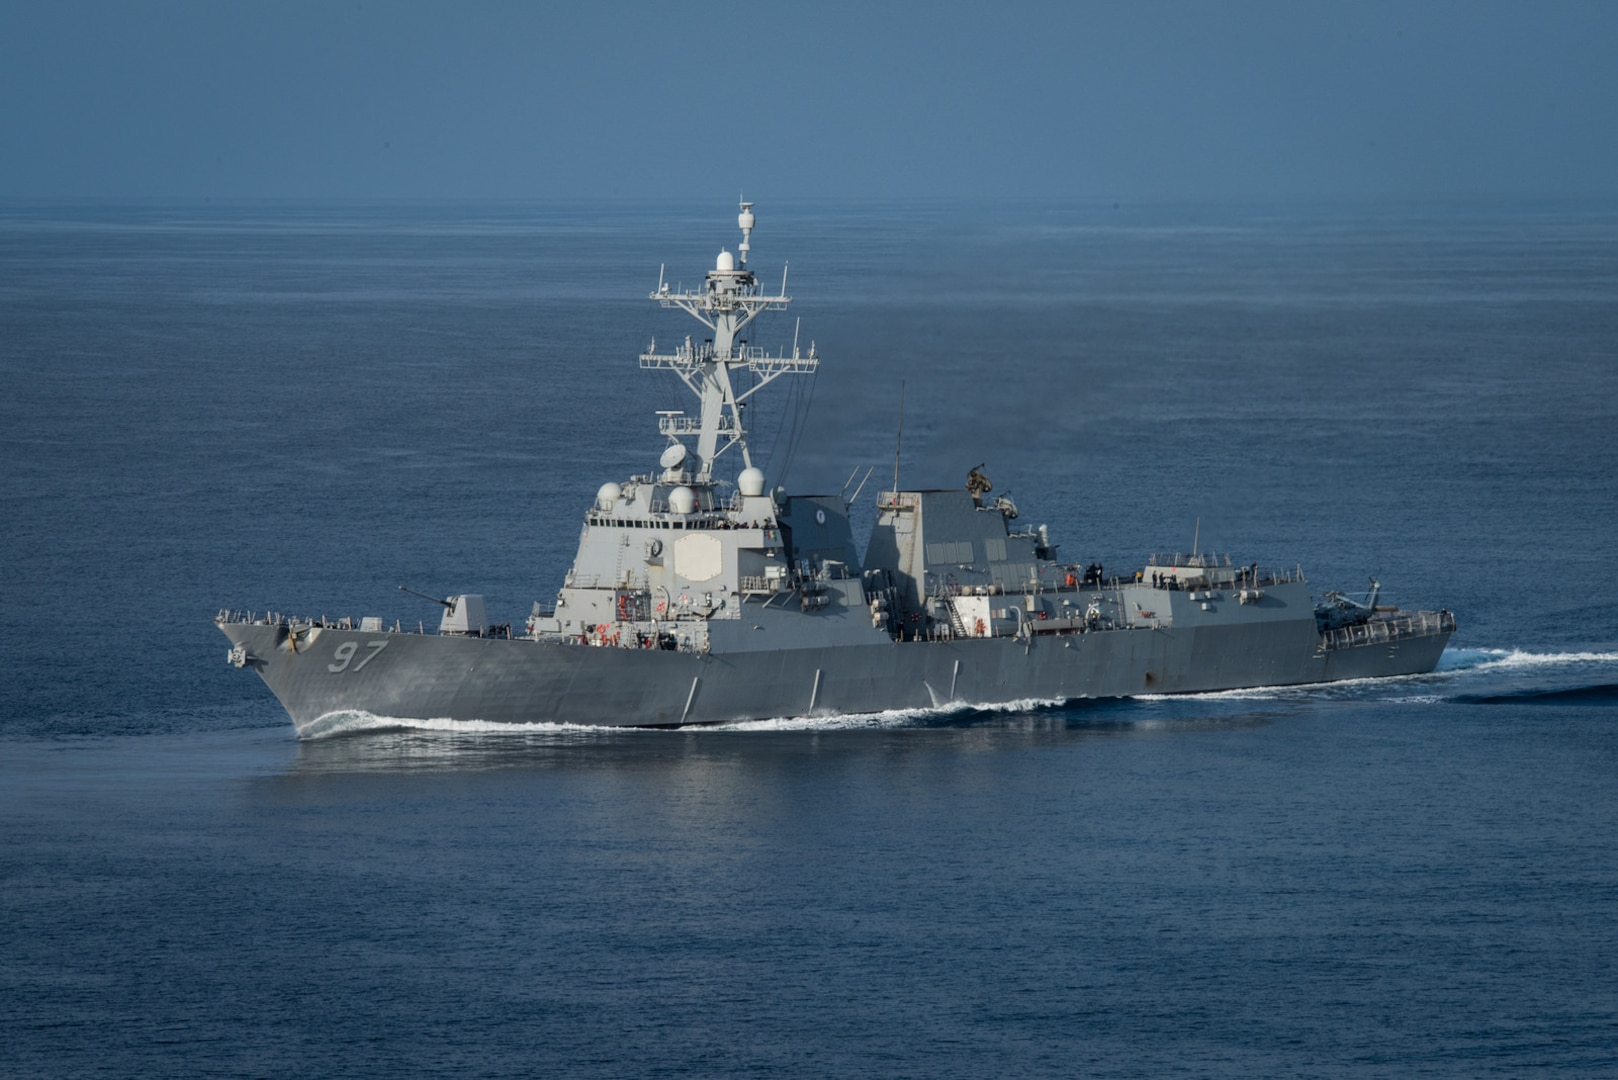 USS Halsey visits Guam during 7th Fleet operations